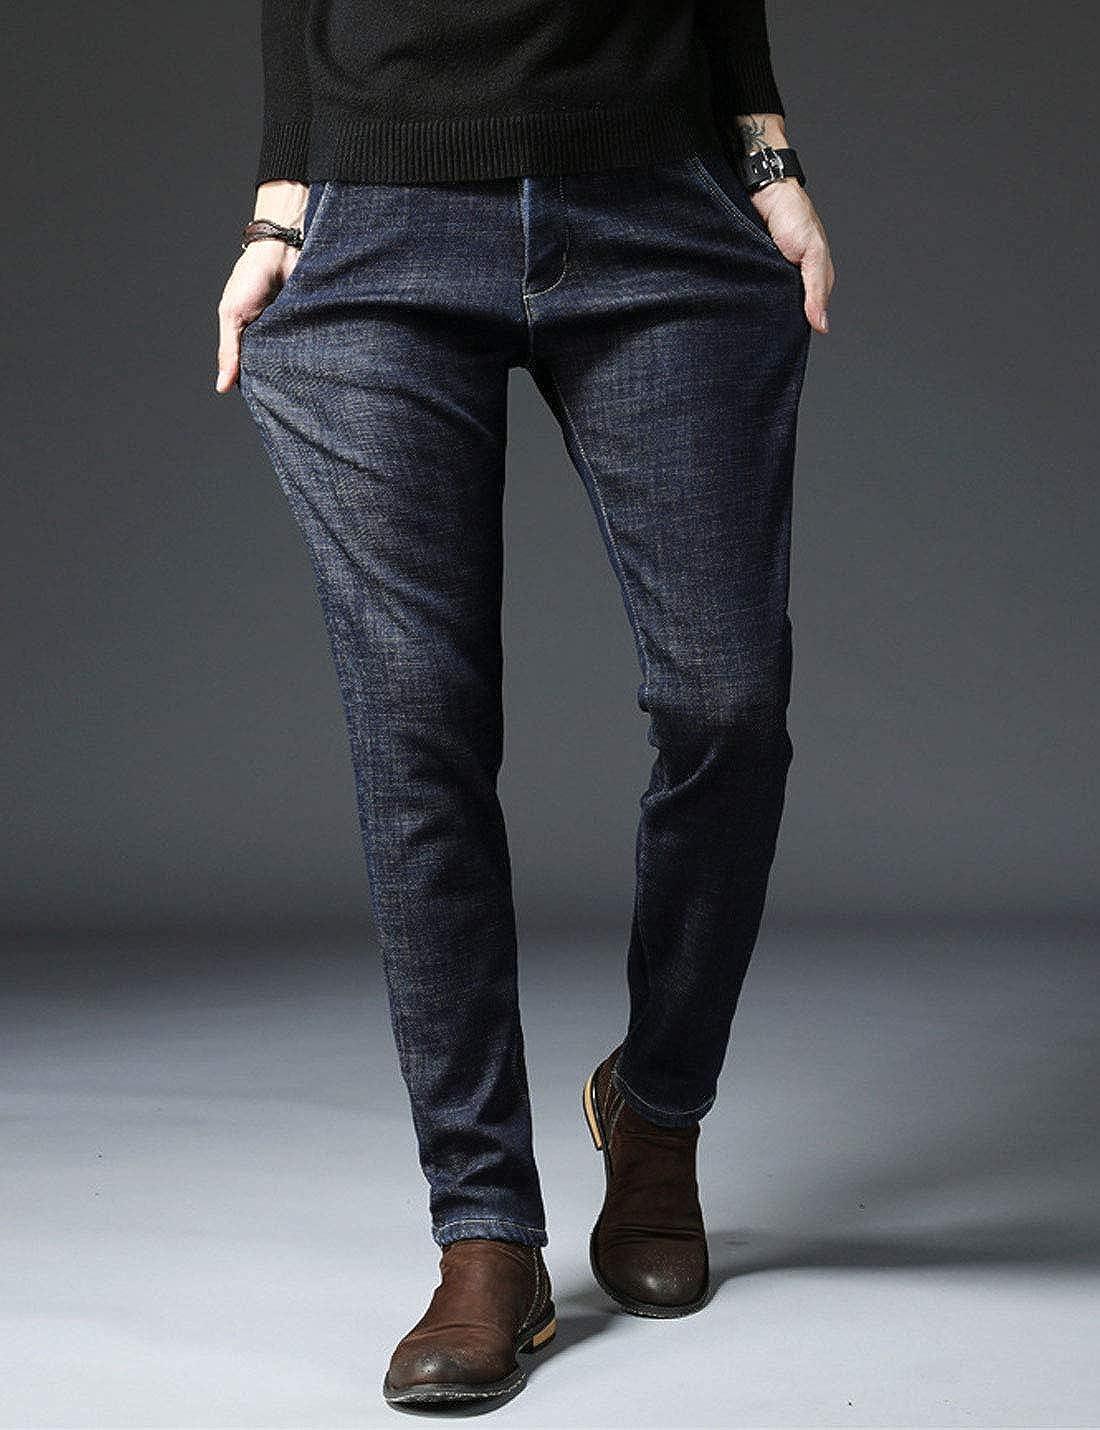 Omoone Mens Strech Slim Fit Fleece Lined Distressed Jeans Pants